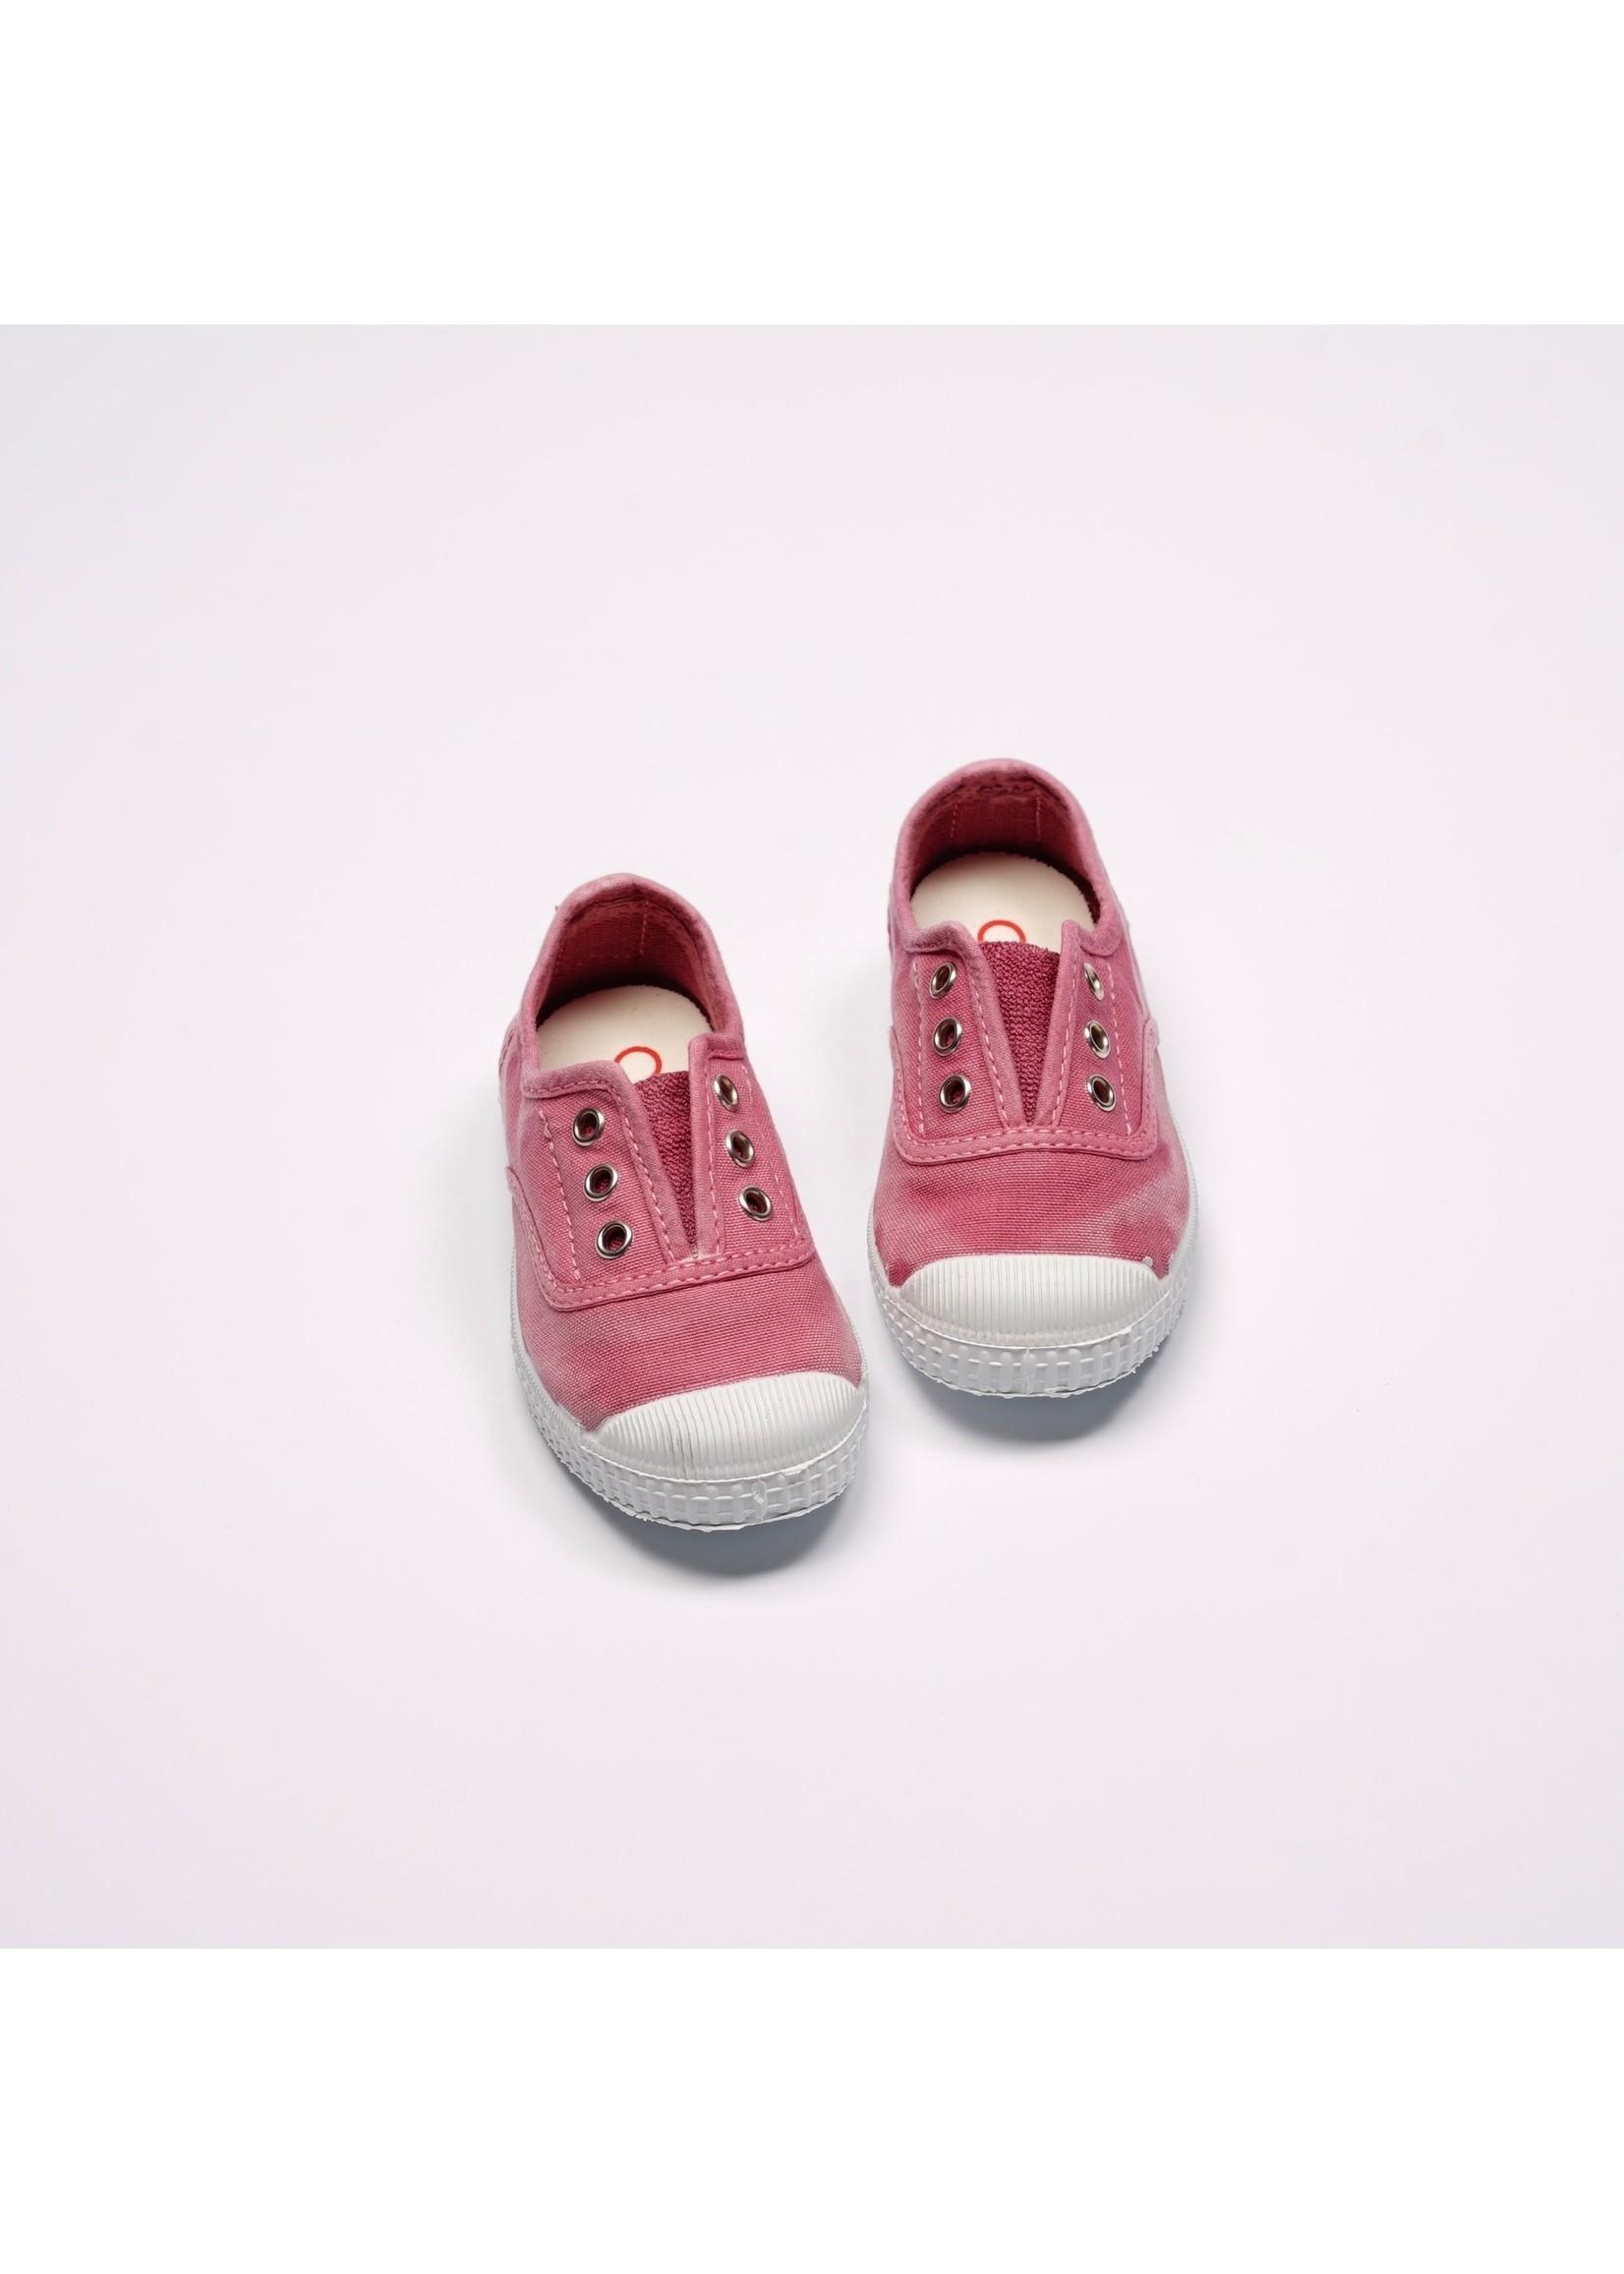 Cienta Cienta Kids Sneakers (Rosa)